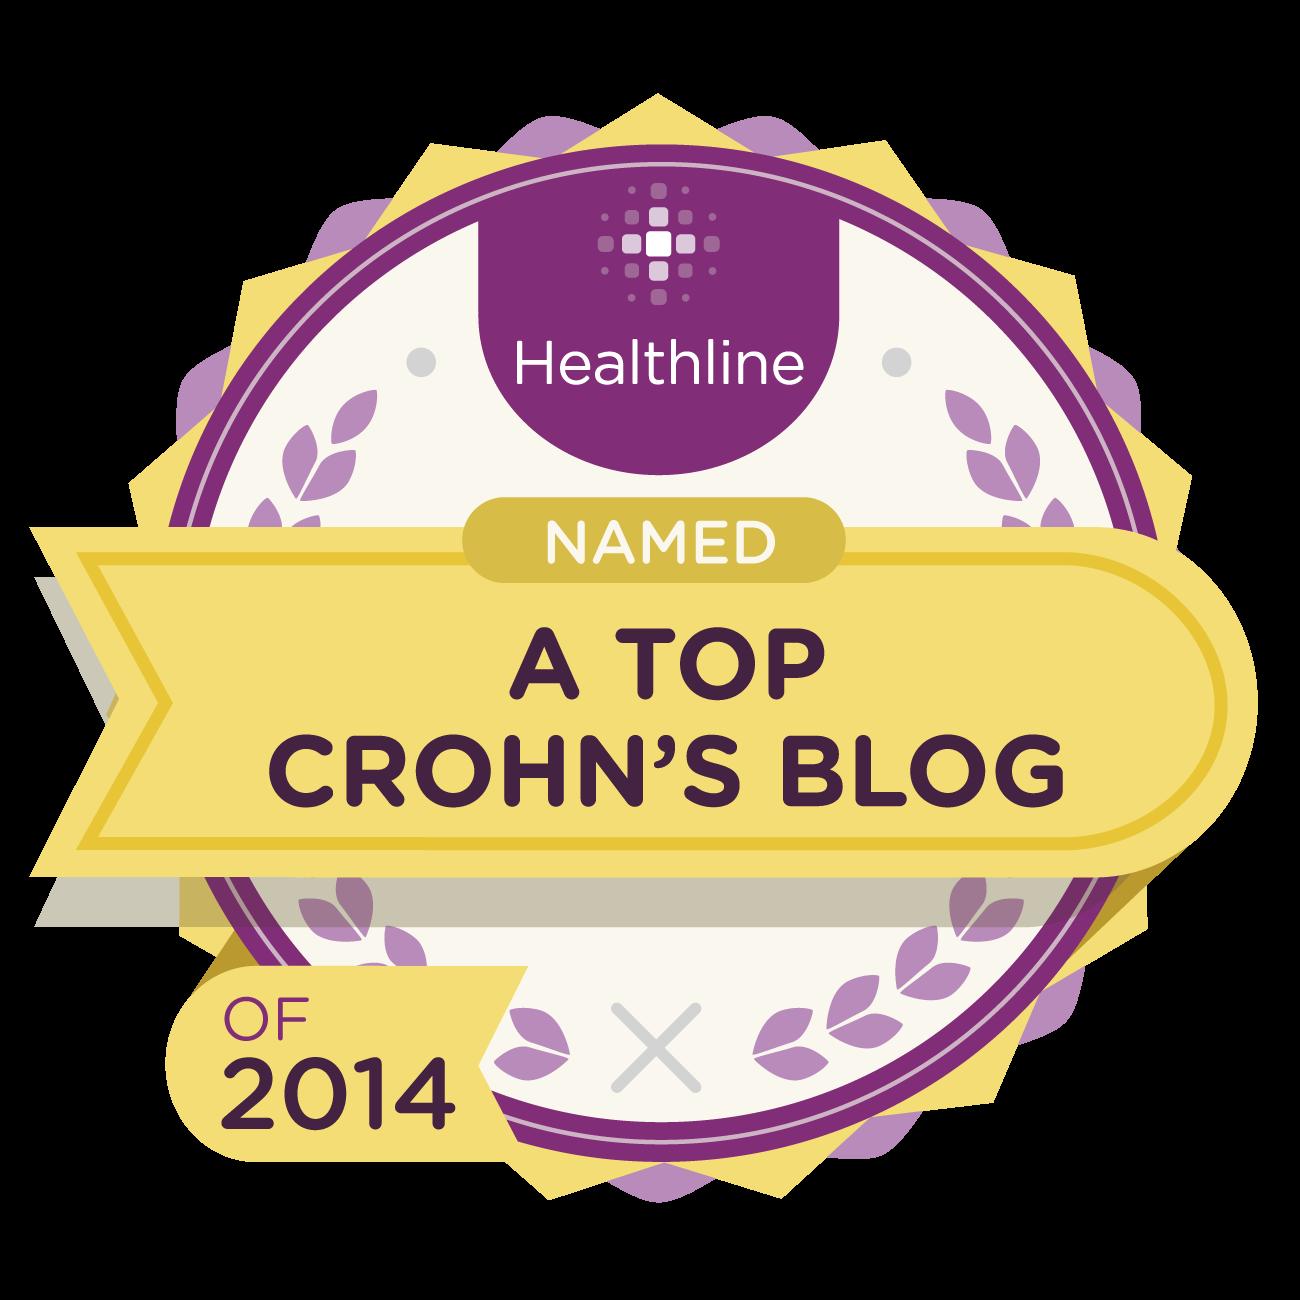 The Best Crohn's Disease Blogs of 2014